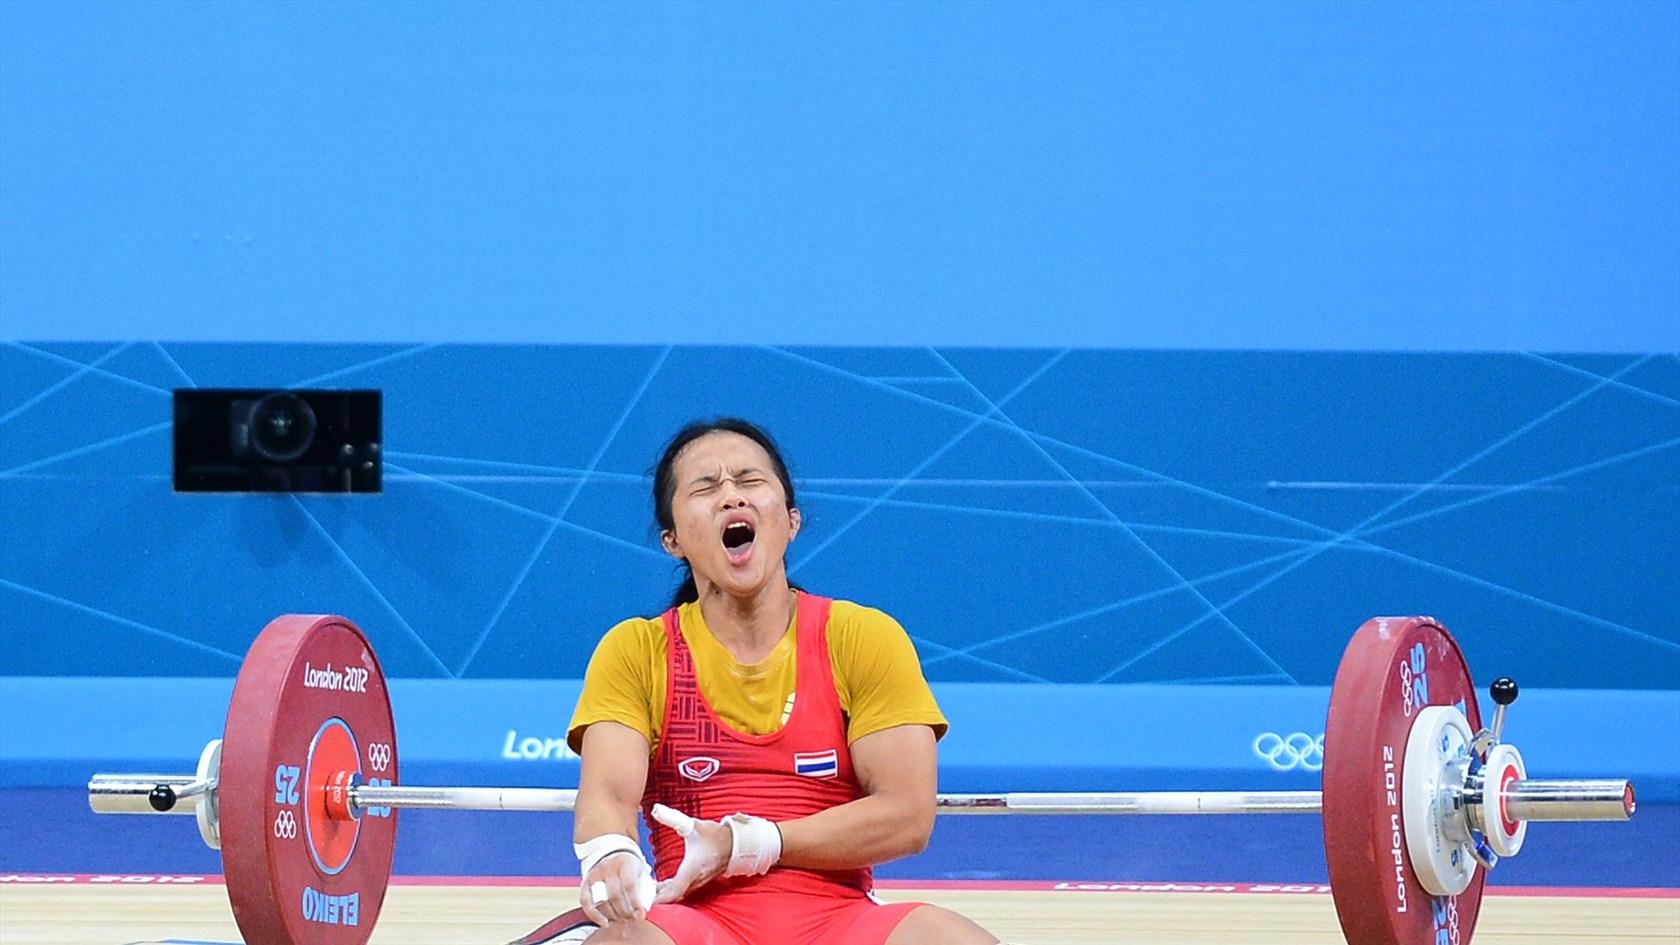 Olympic Lifting Wallpaper